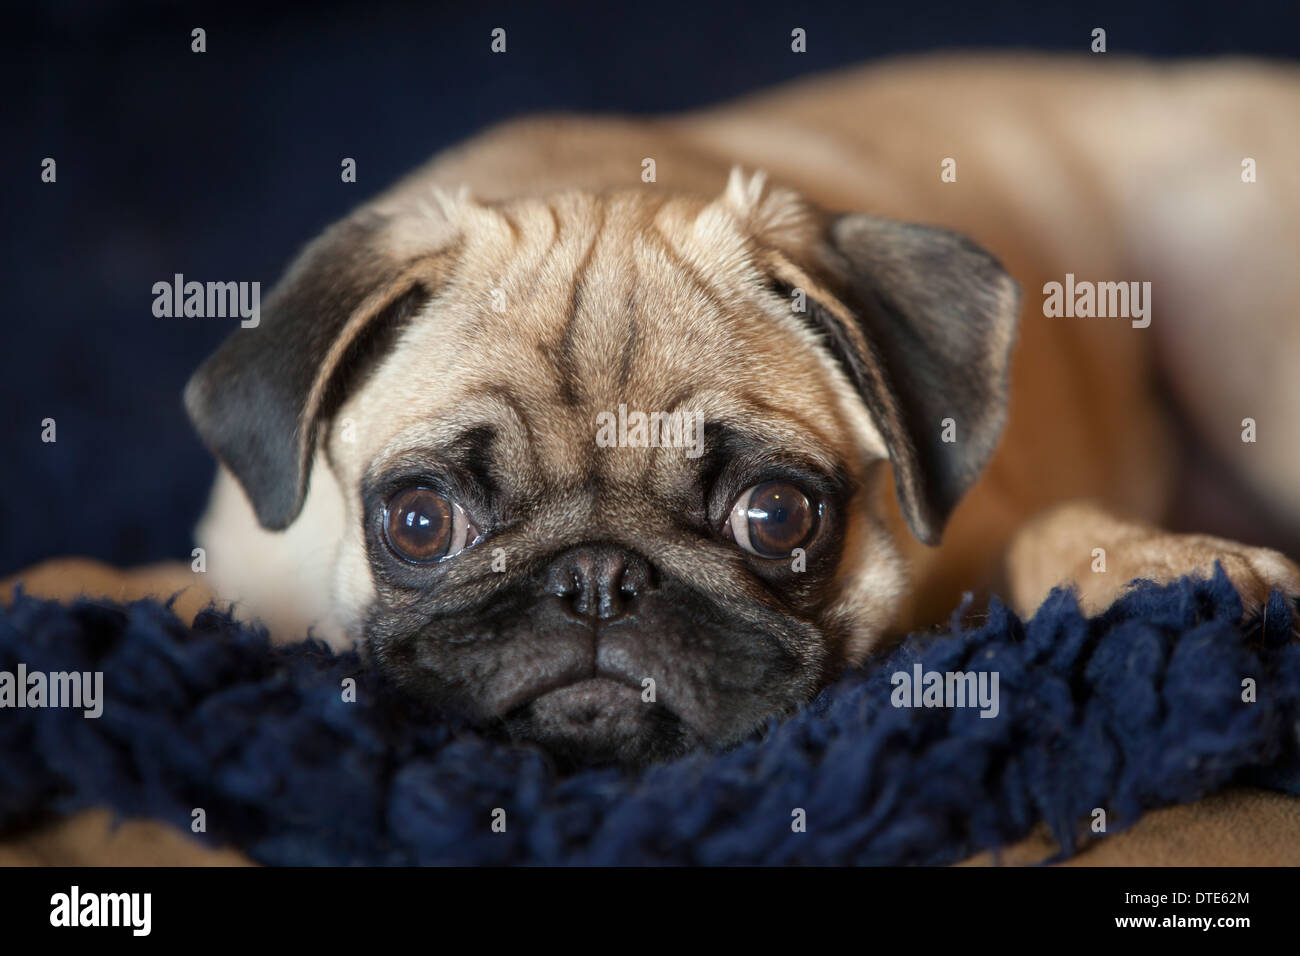 Pug puppy lying down - Stock Image